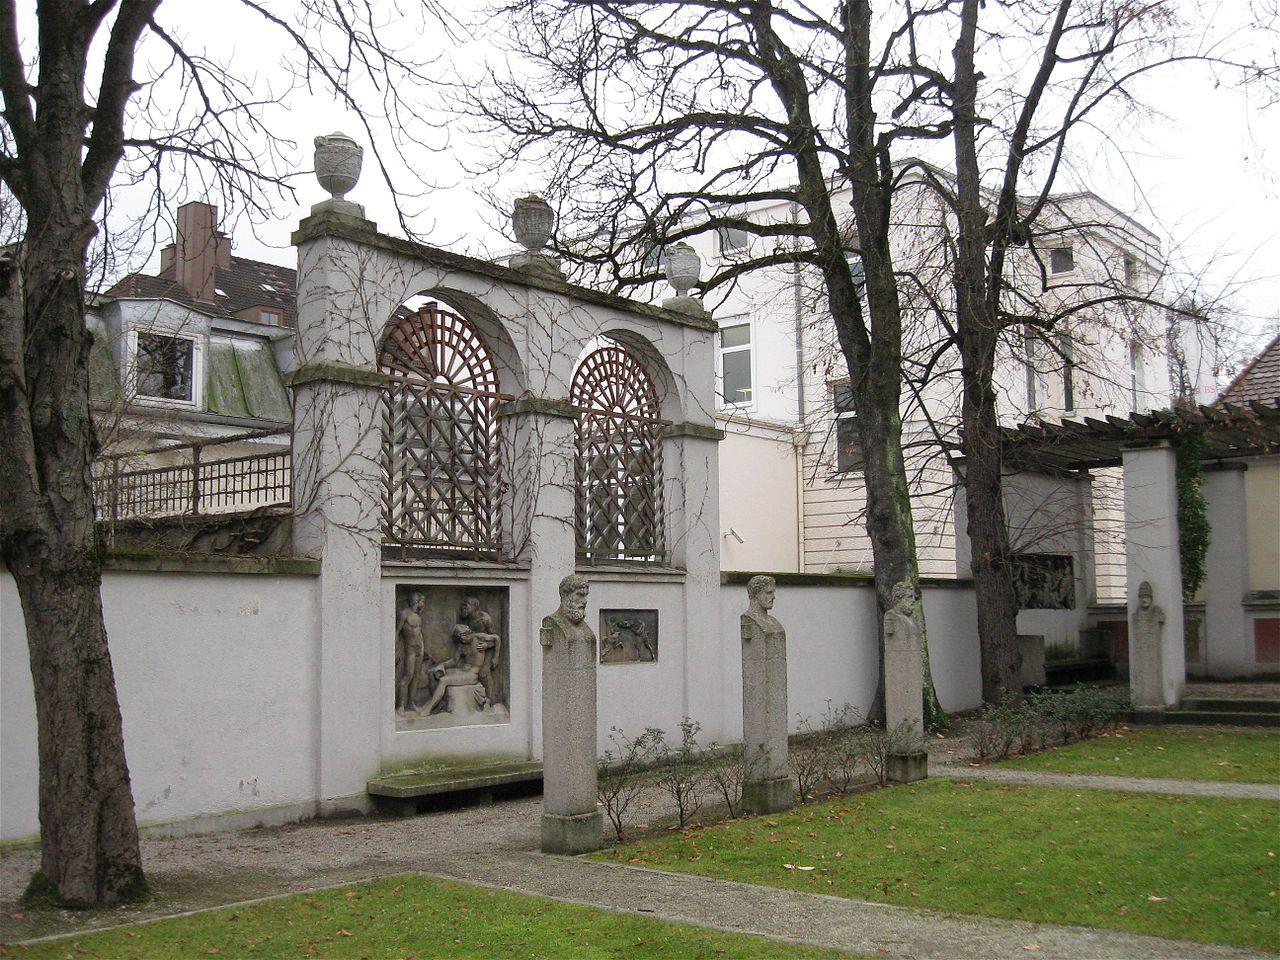 1280px-Innenhof_Villa_Stuck_Muenchen-5.jpg